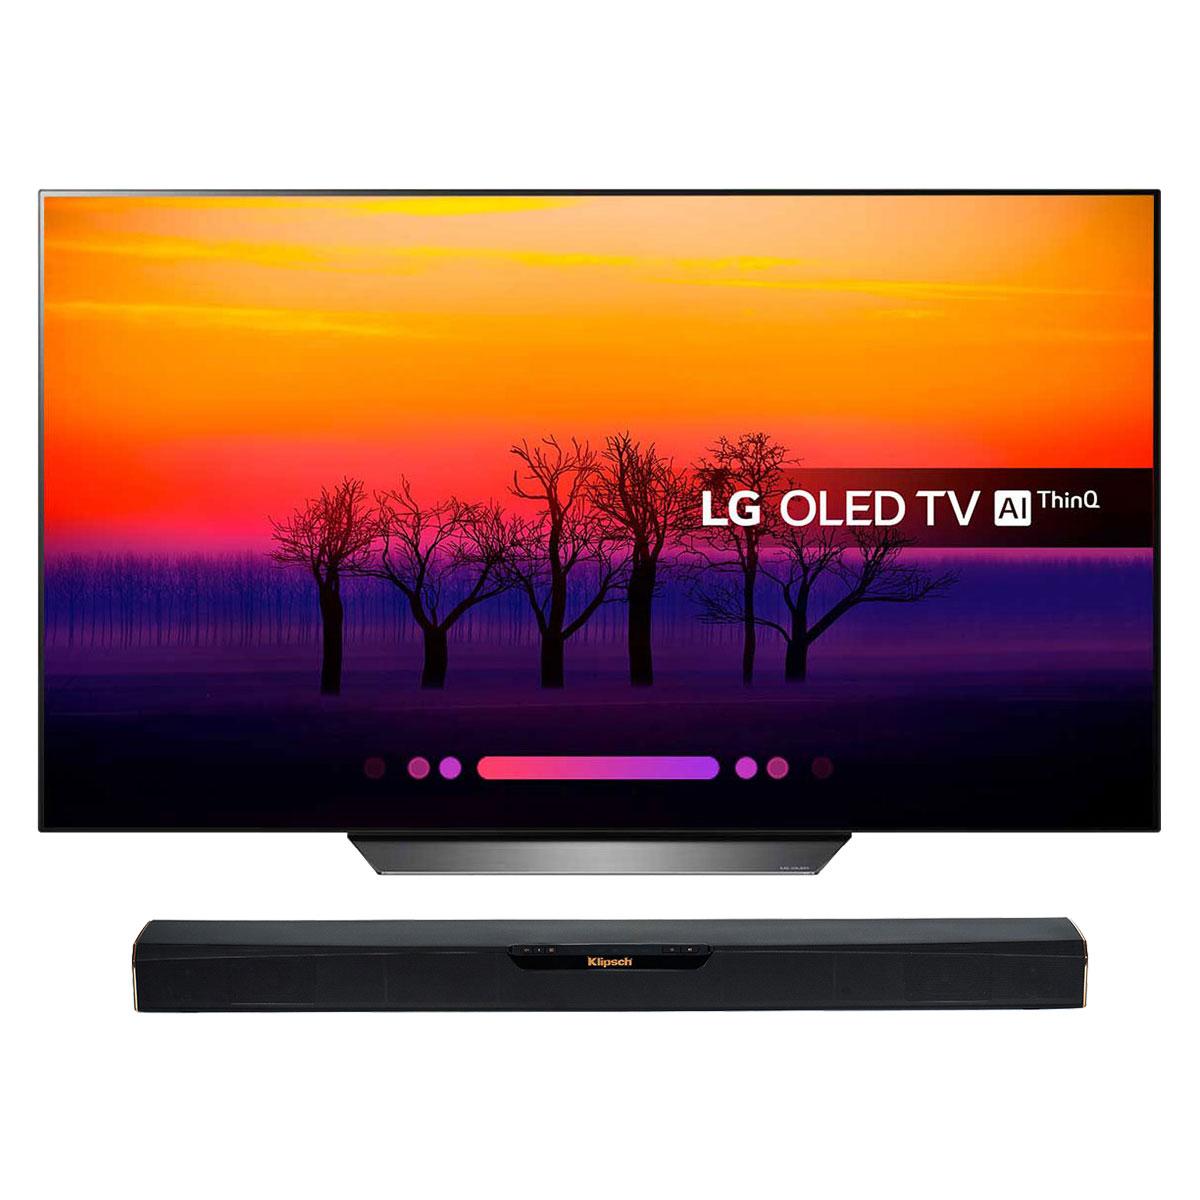 "TV LG OLED55B8 + Klipsch RSB-3 Téléviseur OLED 4K 55"" (140 cm) 16/9 - 3840 x 2160 pixels - Ultra HD 2160p - HDR - Wi-Fi - Bluetooth - Dolby Atmos + Barre de son 2.0 avec technologie Bluetooth"